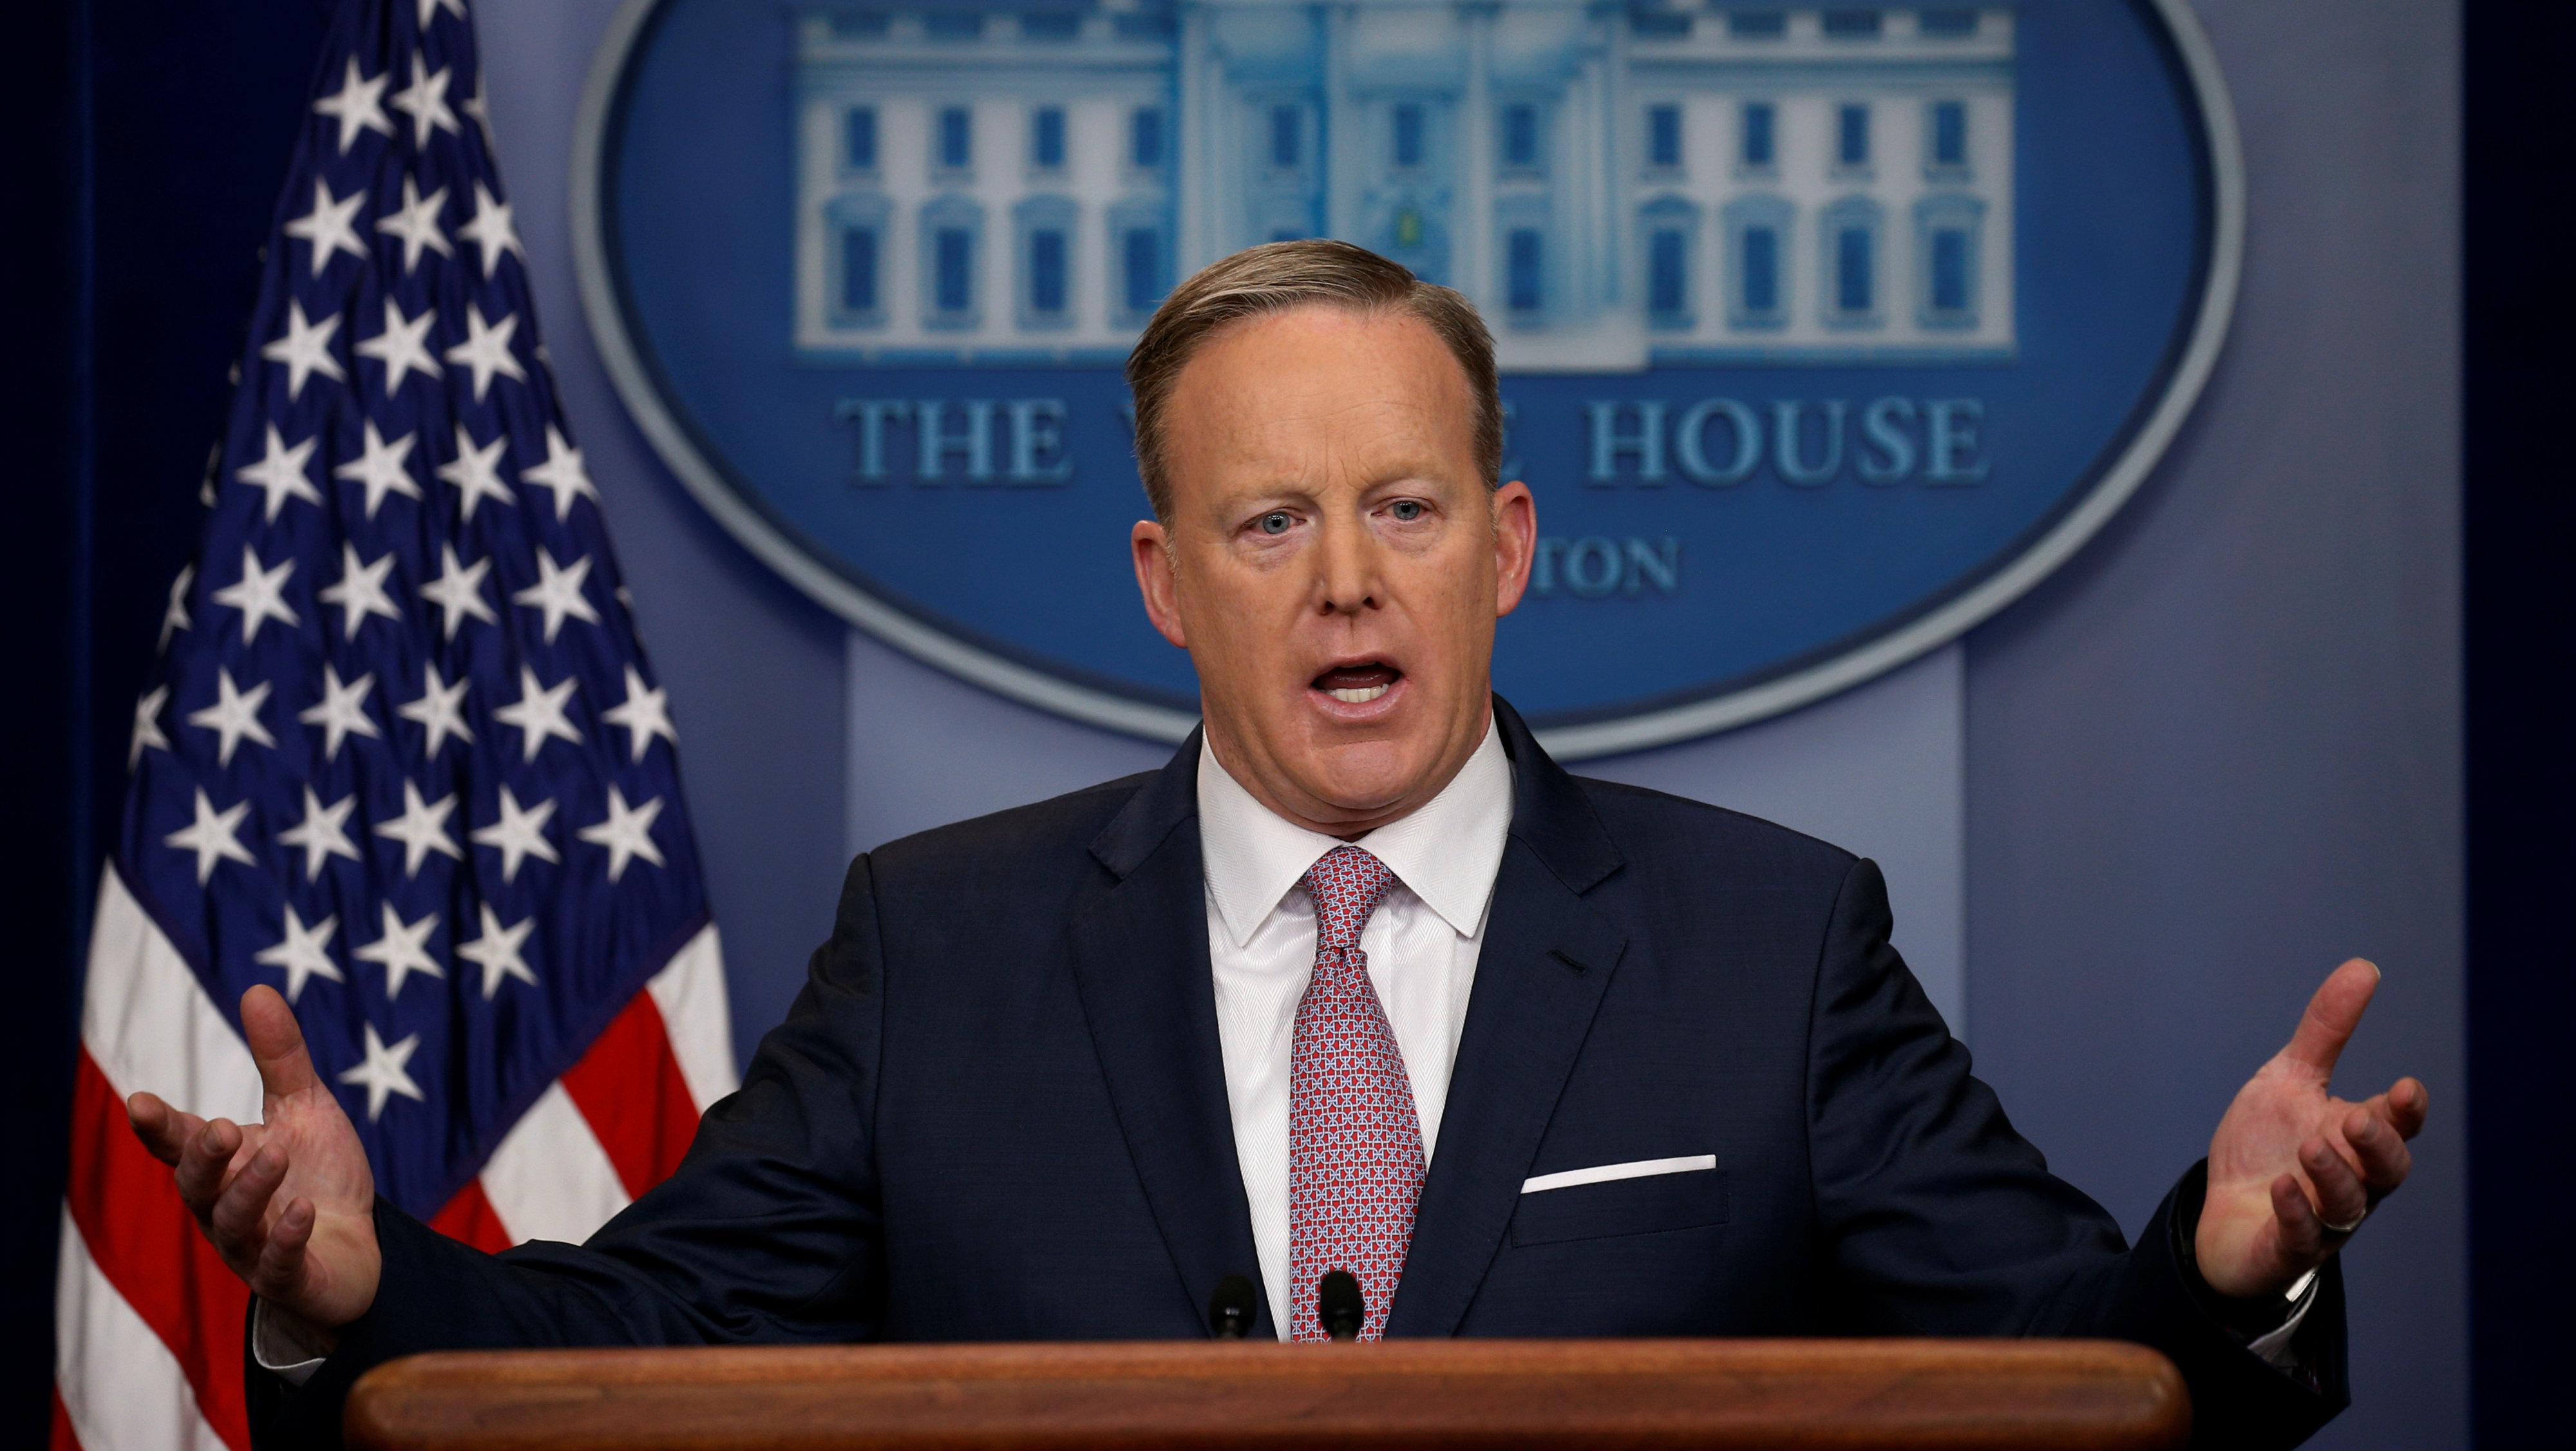 White House Press Secretary Sean Spicer at a podium.